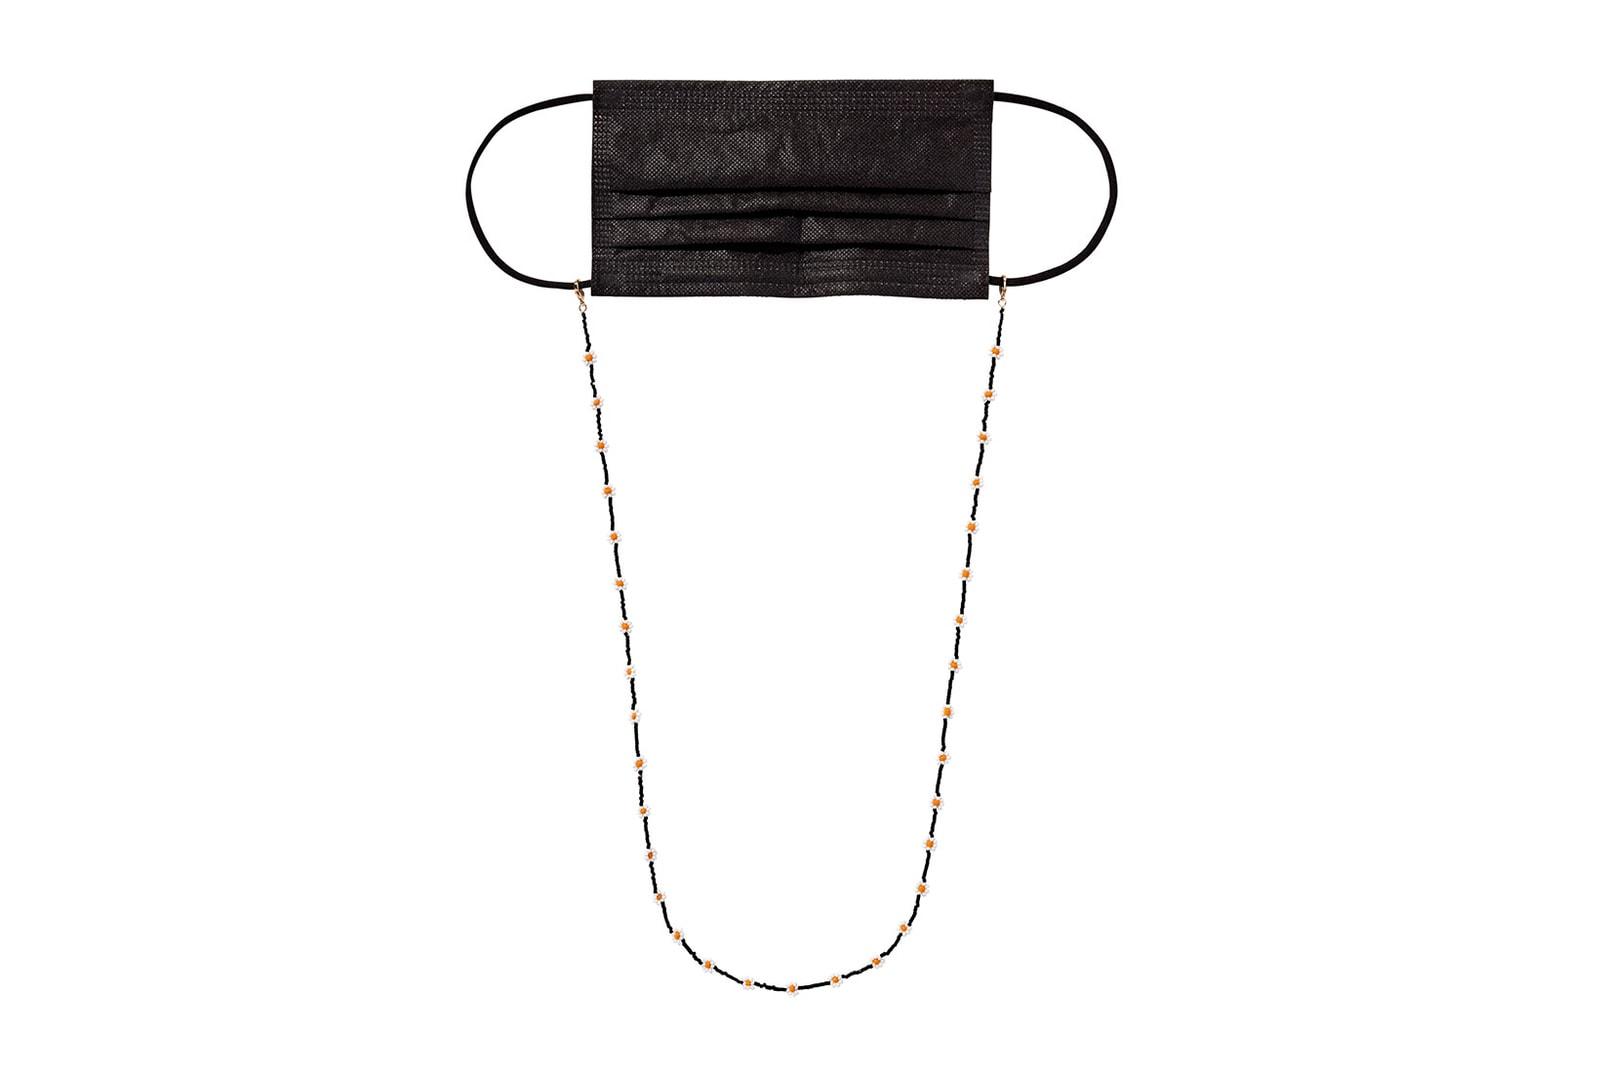 best mask chains straps holders beads pearls accessories sundae school gelareh mizrahi eliou covid19 coronavirus